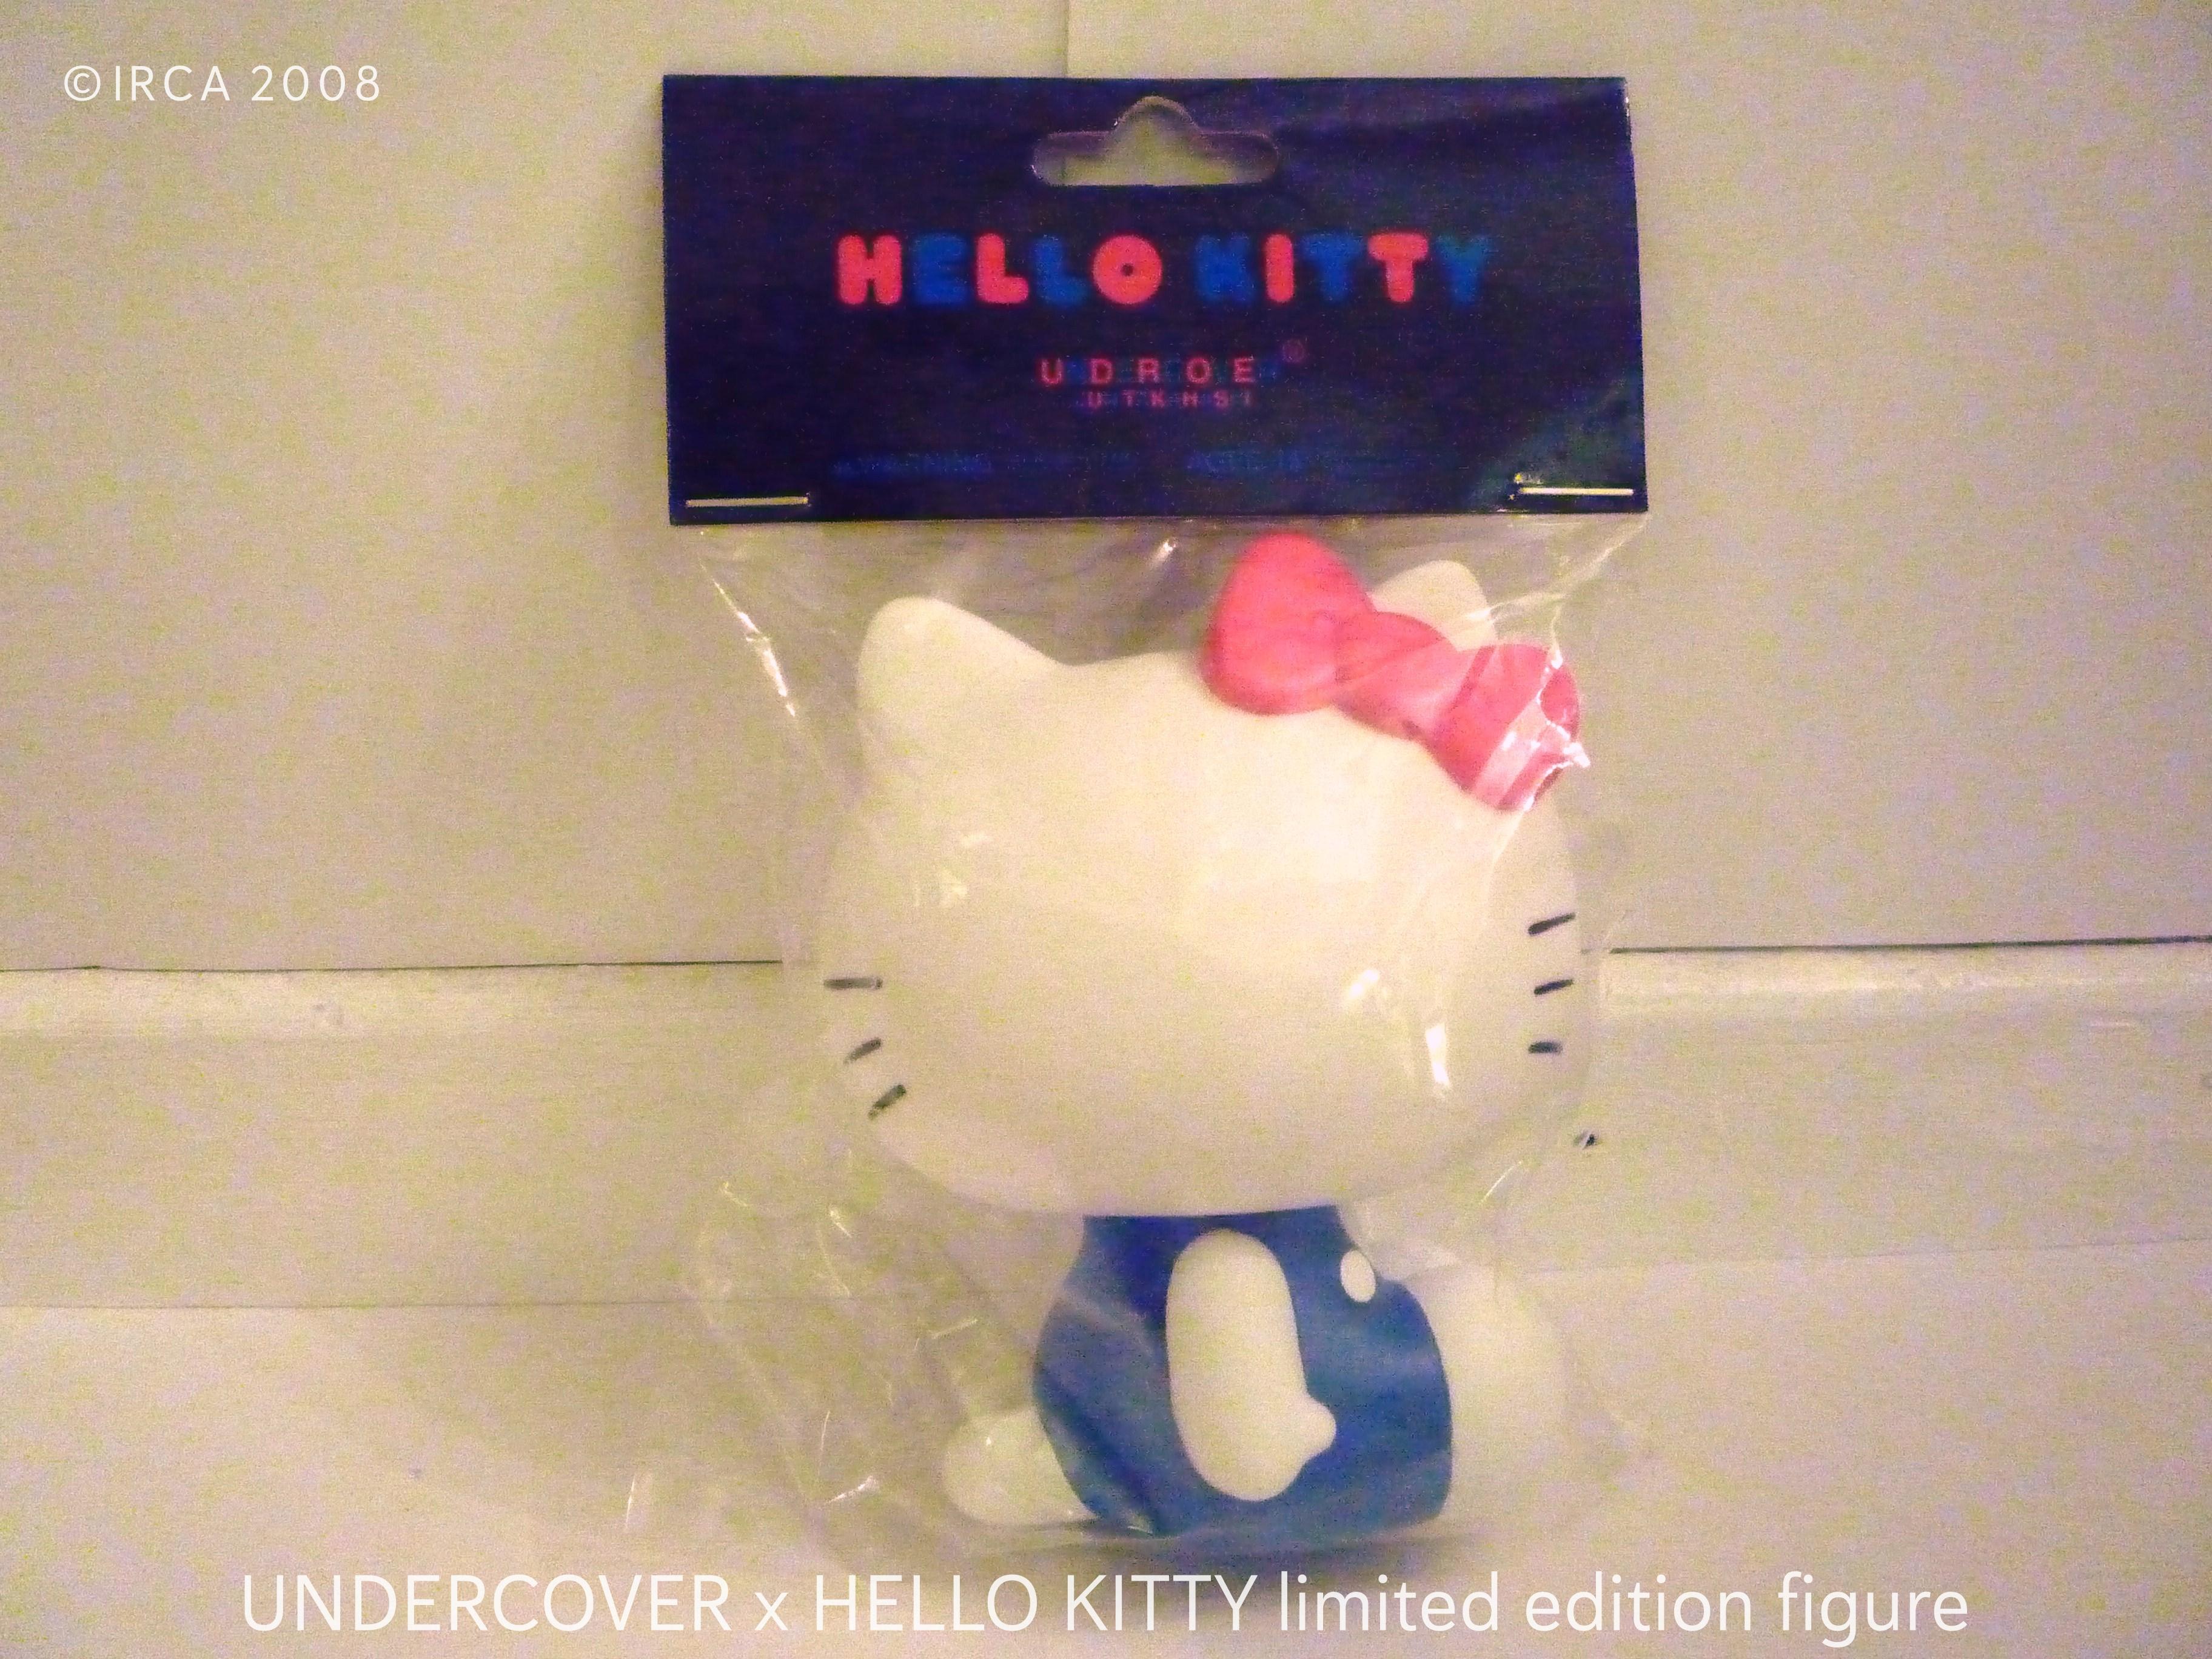 UNDERCOVER x Hello Kitty vinyl figure1